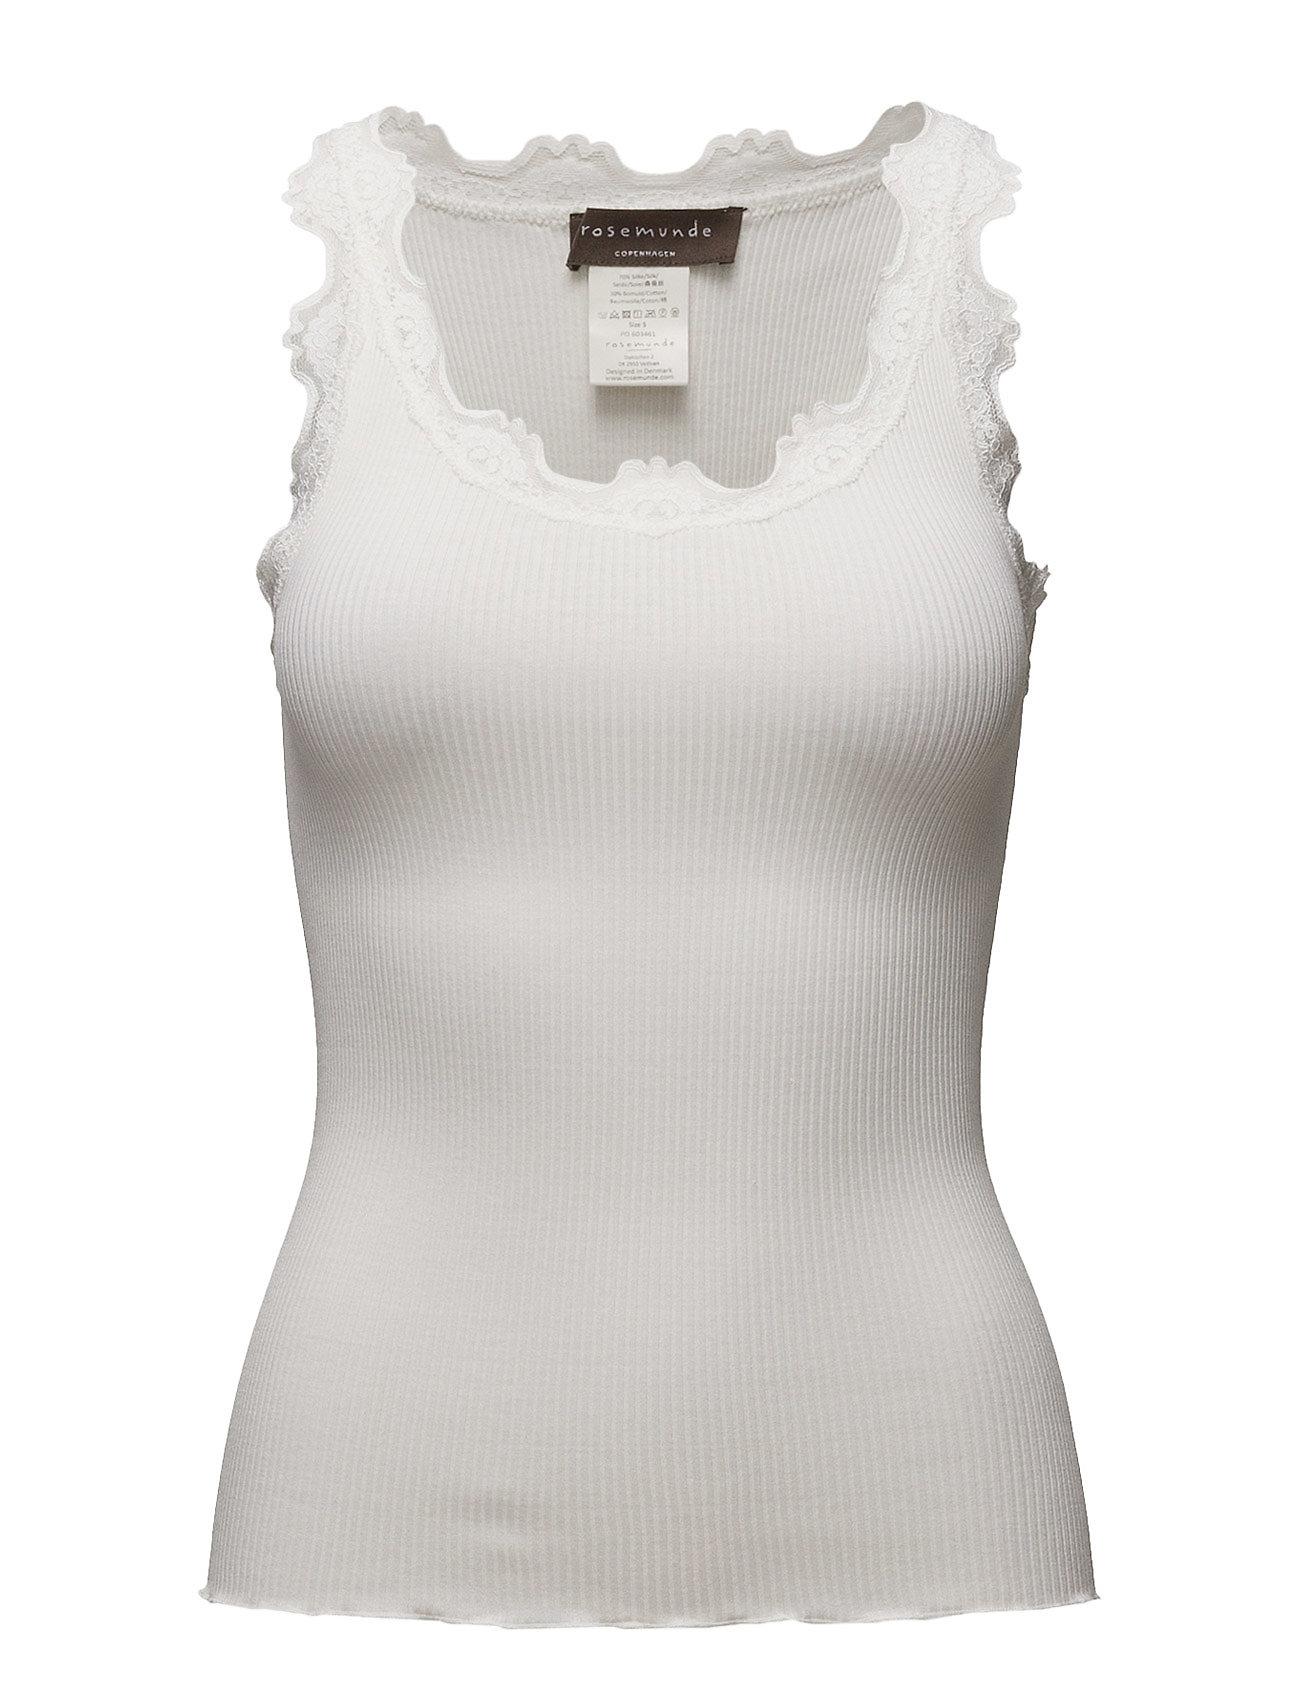 Rosemunde Silk top regular w/vintage lace - NEW WHITE